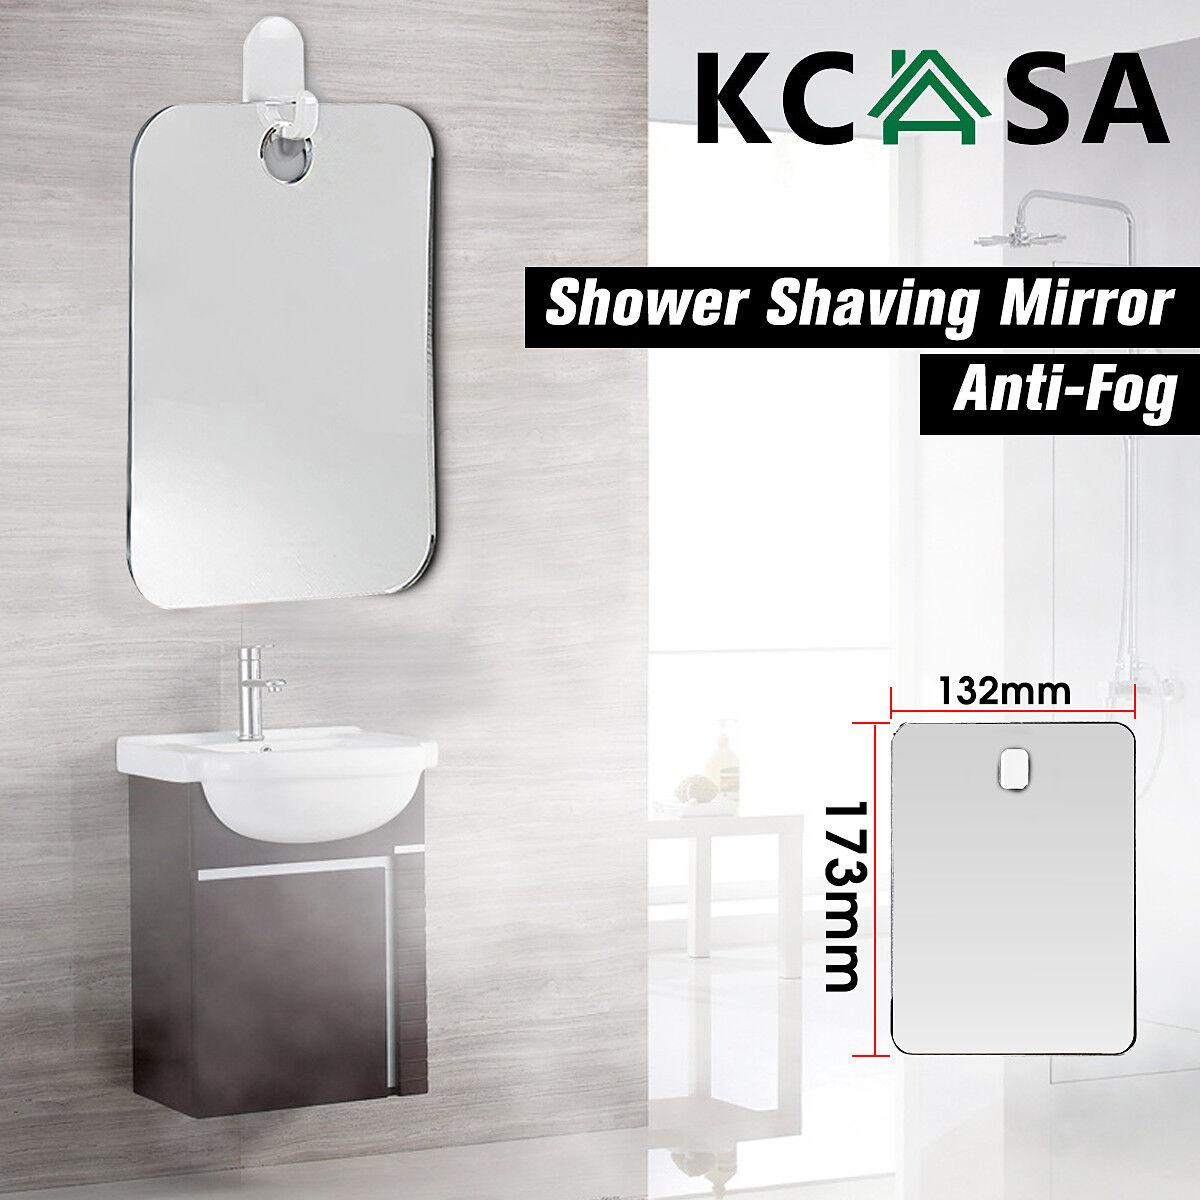 KCASA 173x132 Anti-fog Portable Bathroom Shower Mirror Travel ...